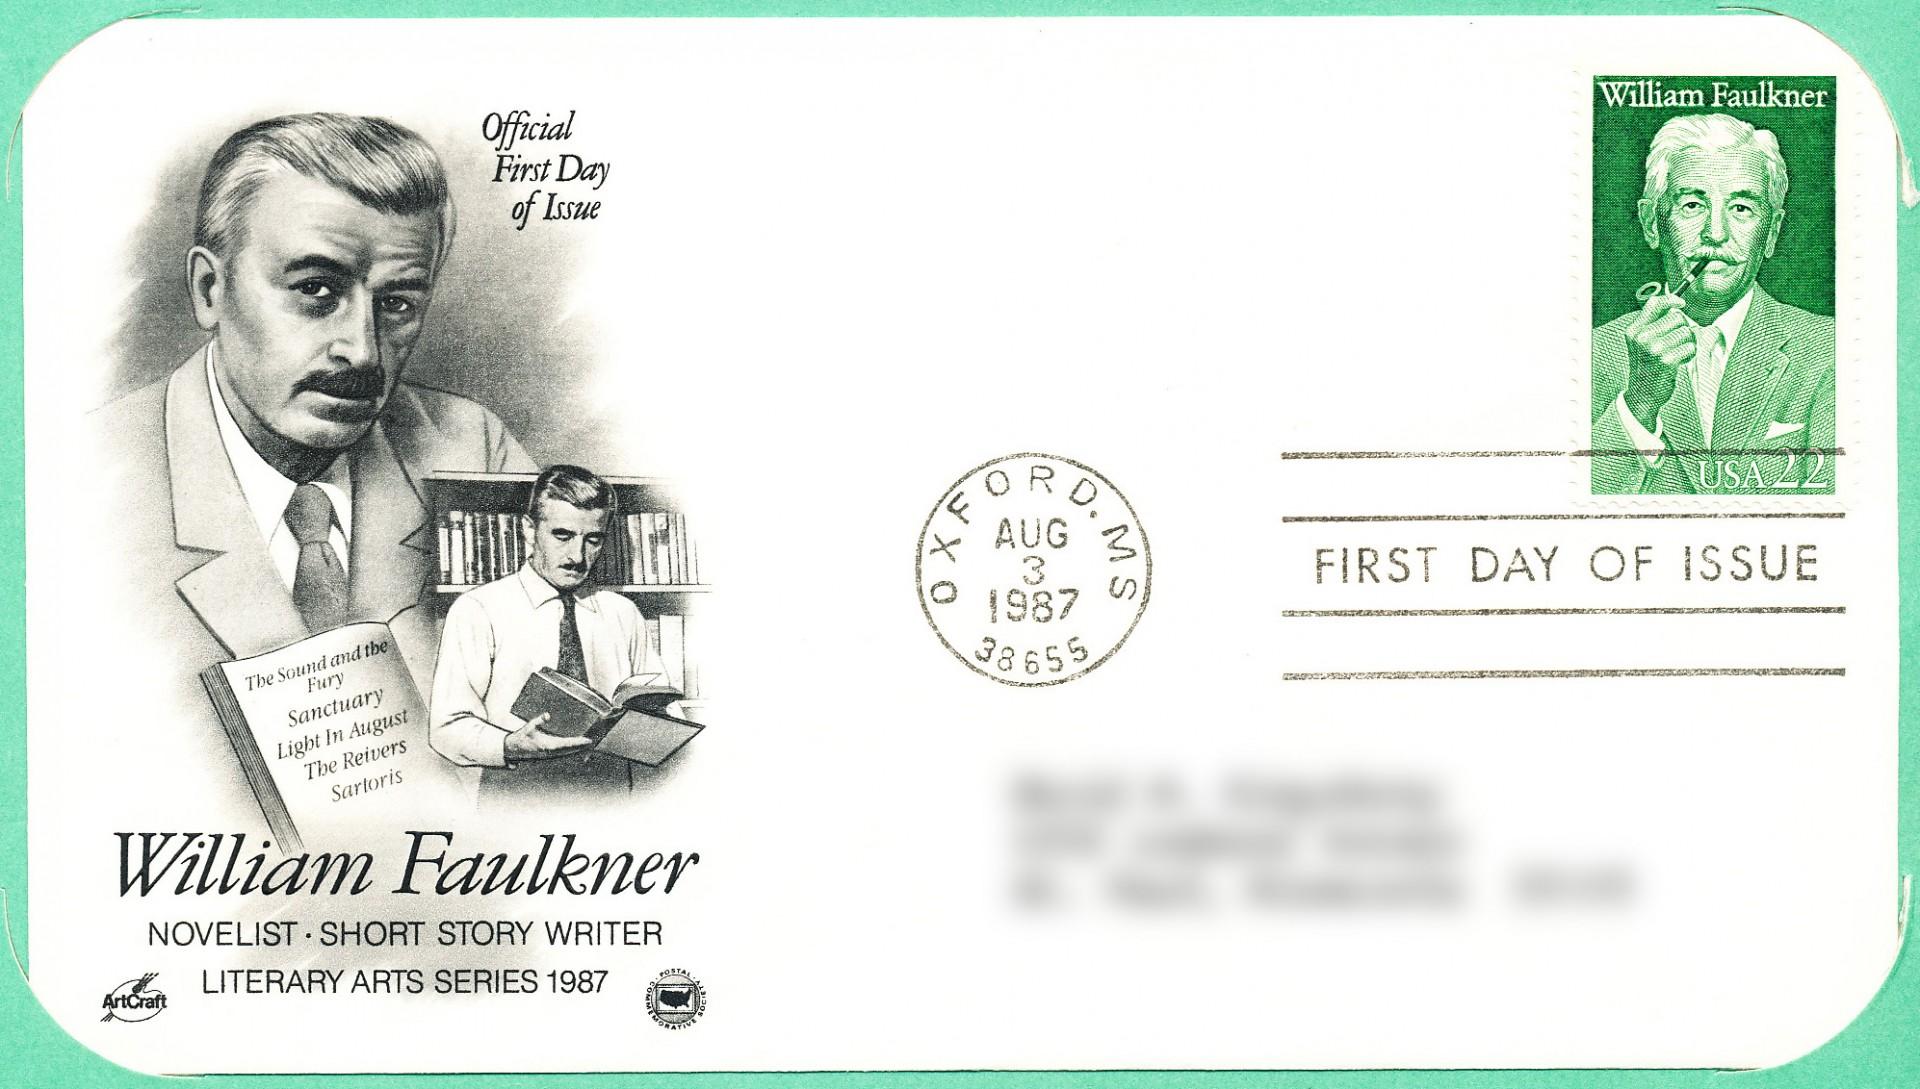 009 Williamfaulknerstamp William Faulkner Essays Essay Stunning Topics 1920